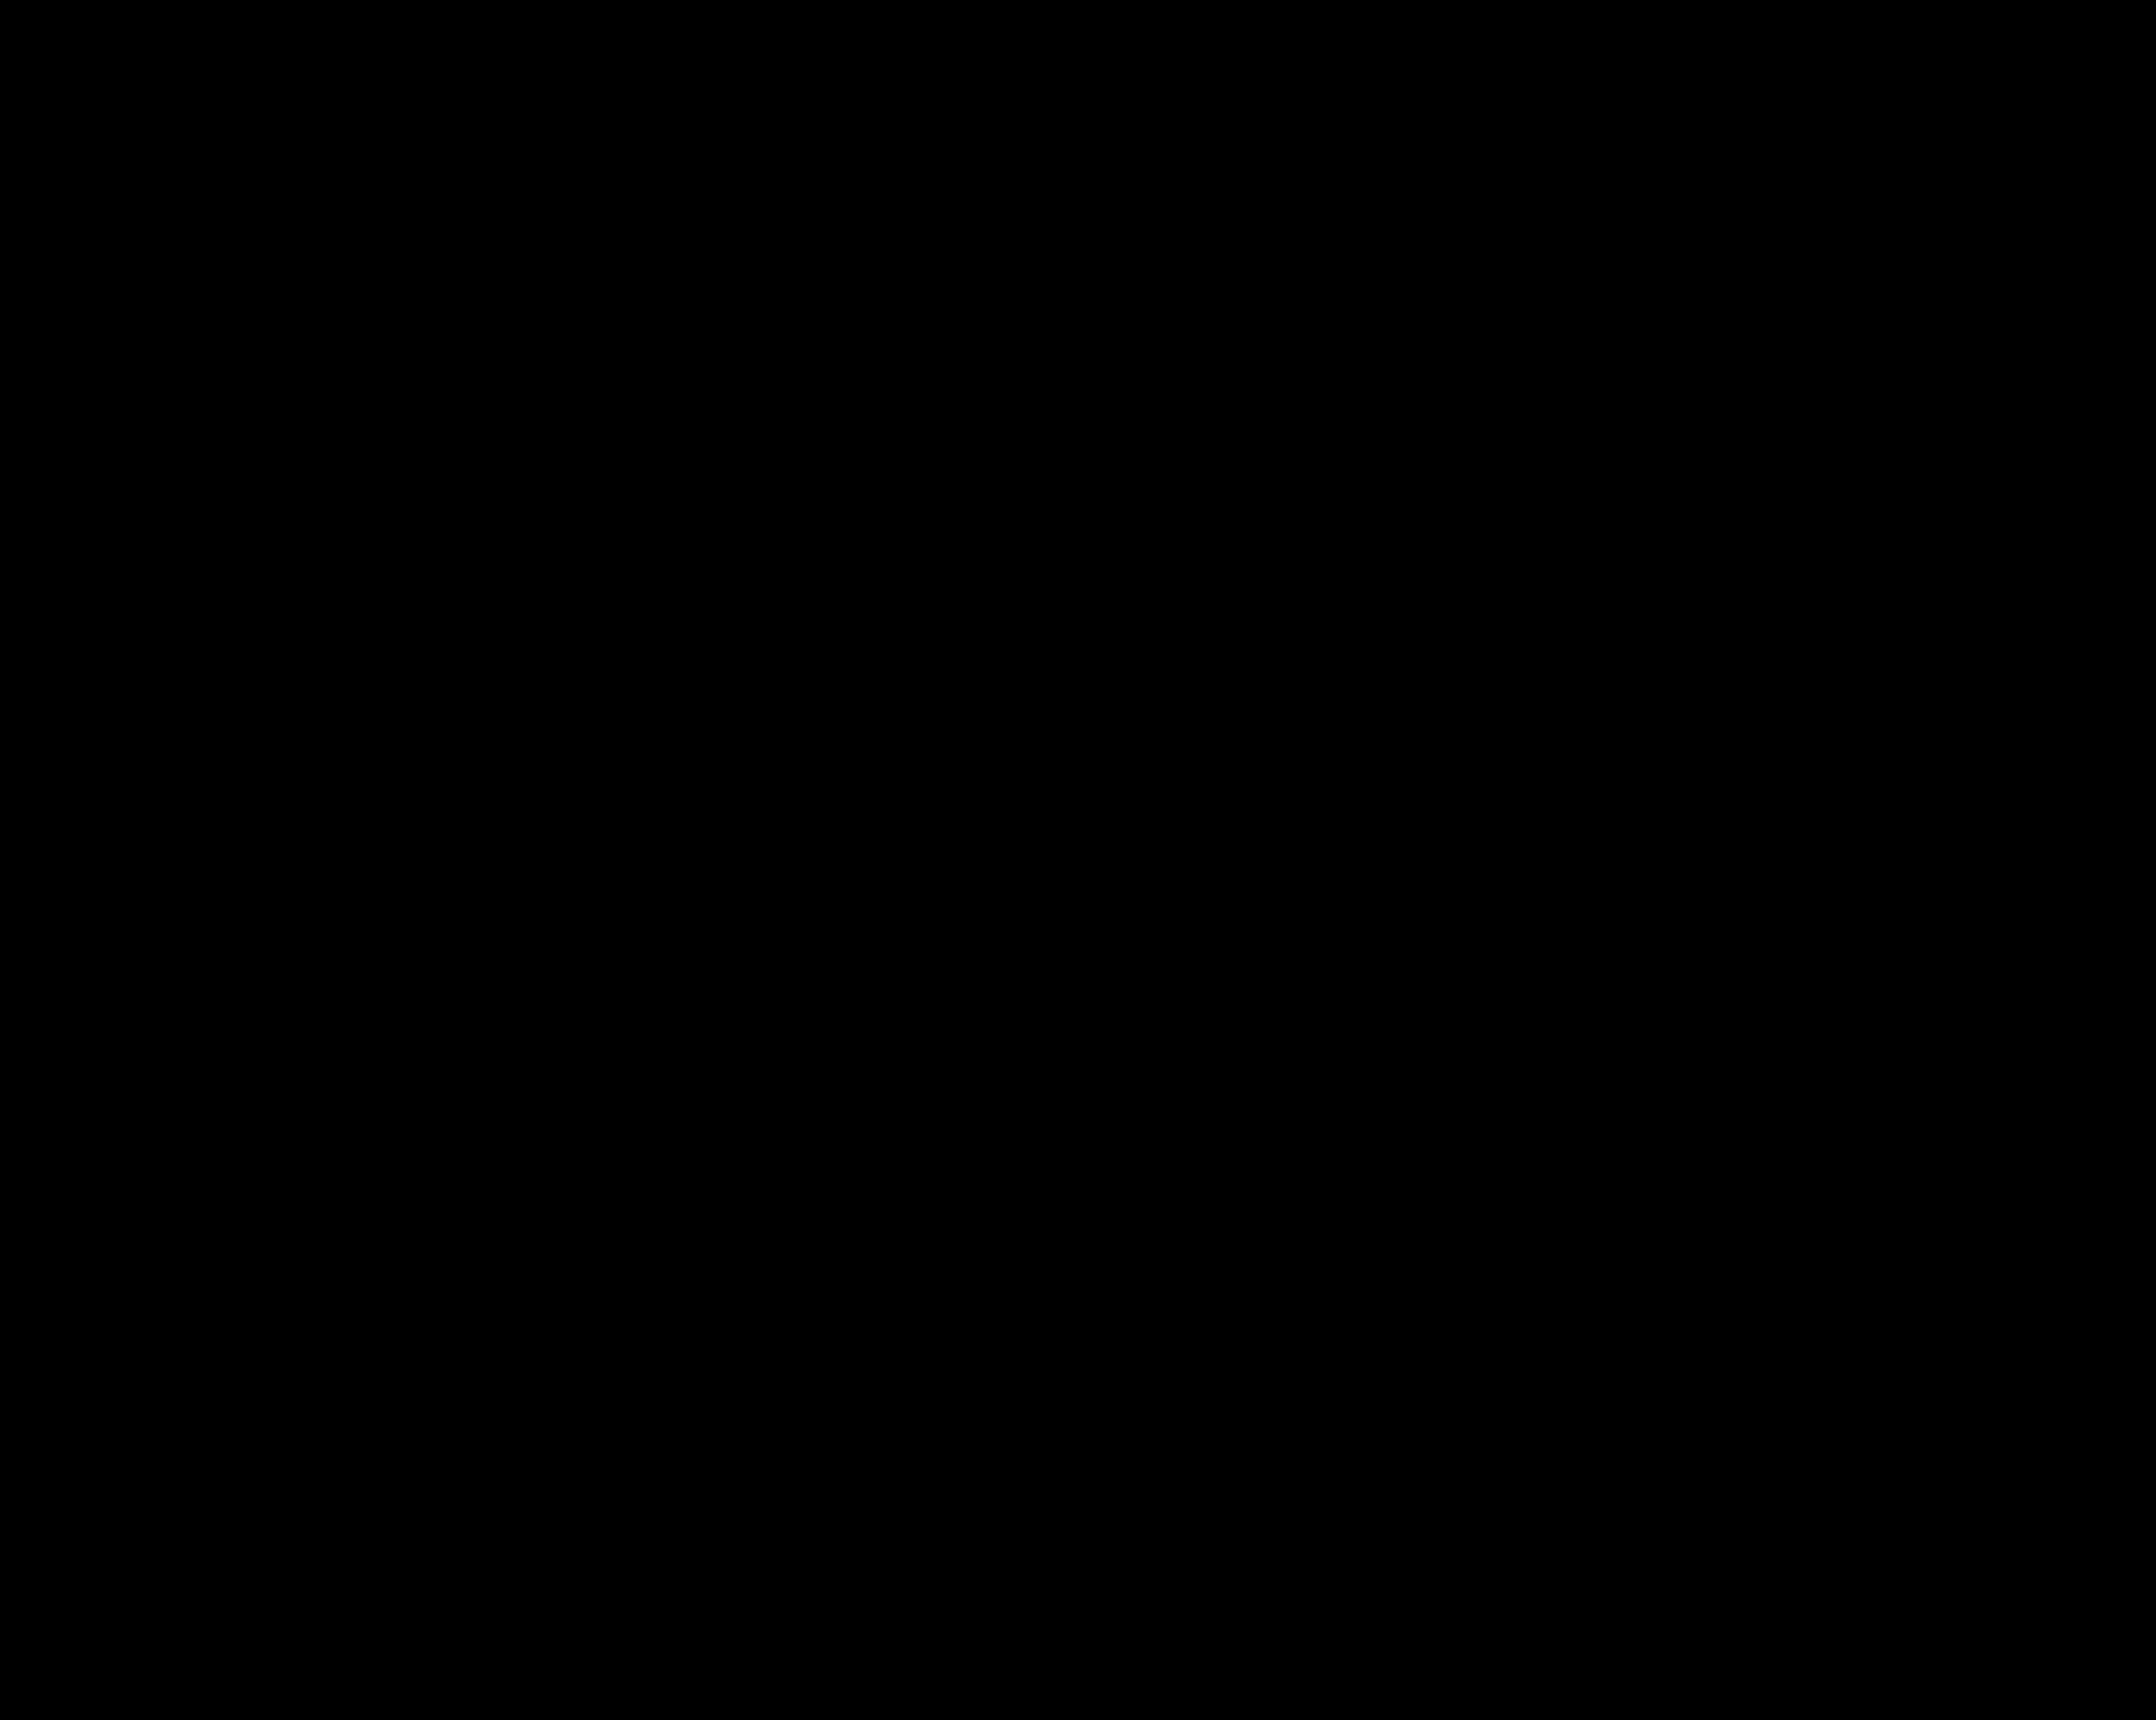 2400x1915 Scroll Vector Art Image